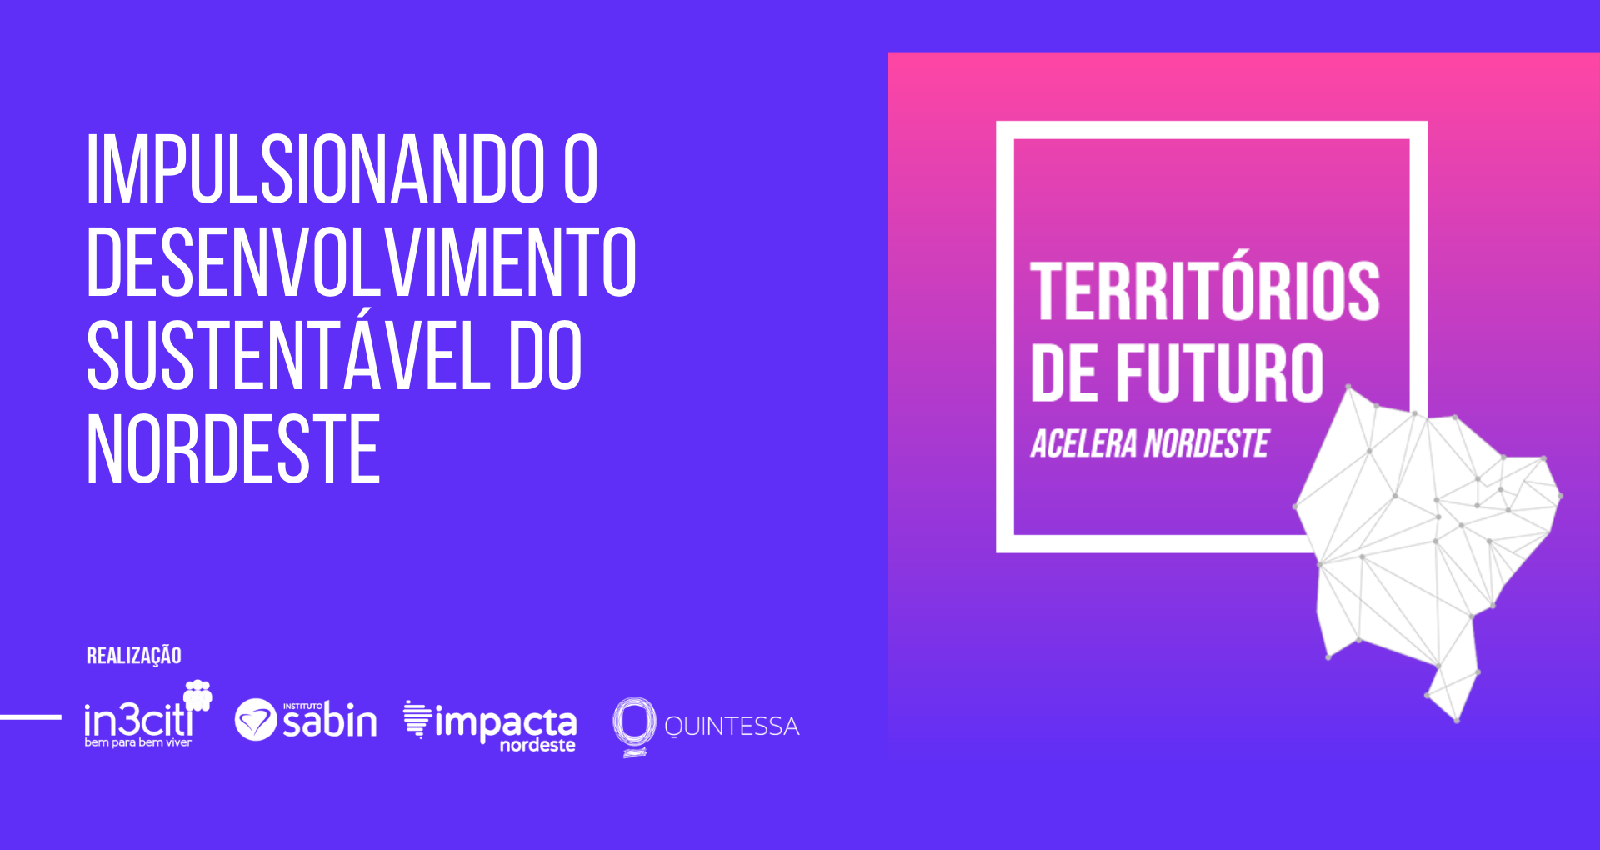 Programa Territórios do Futuro: Acelera Nordeste